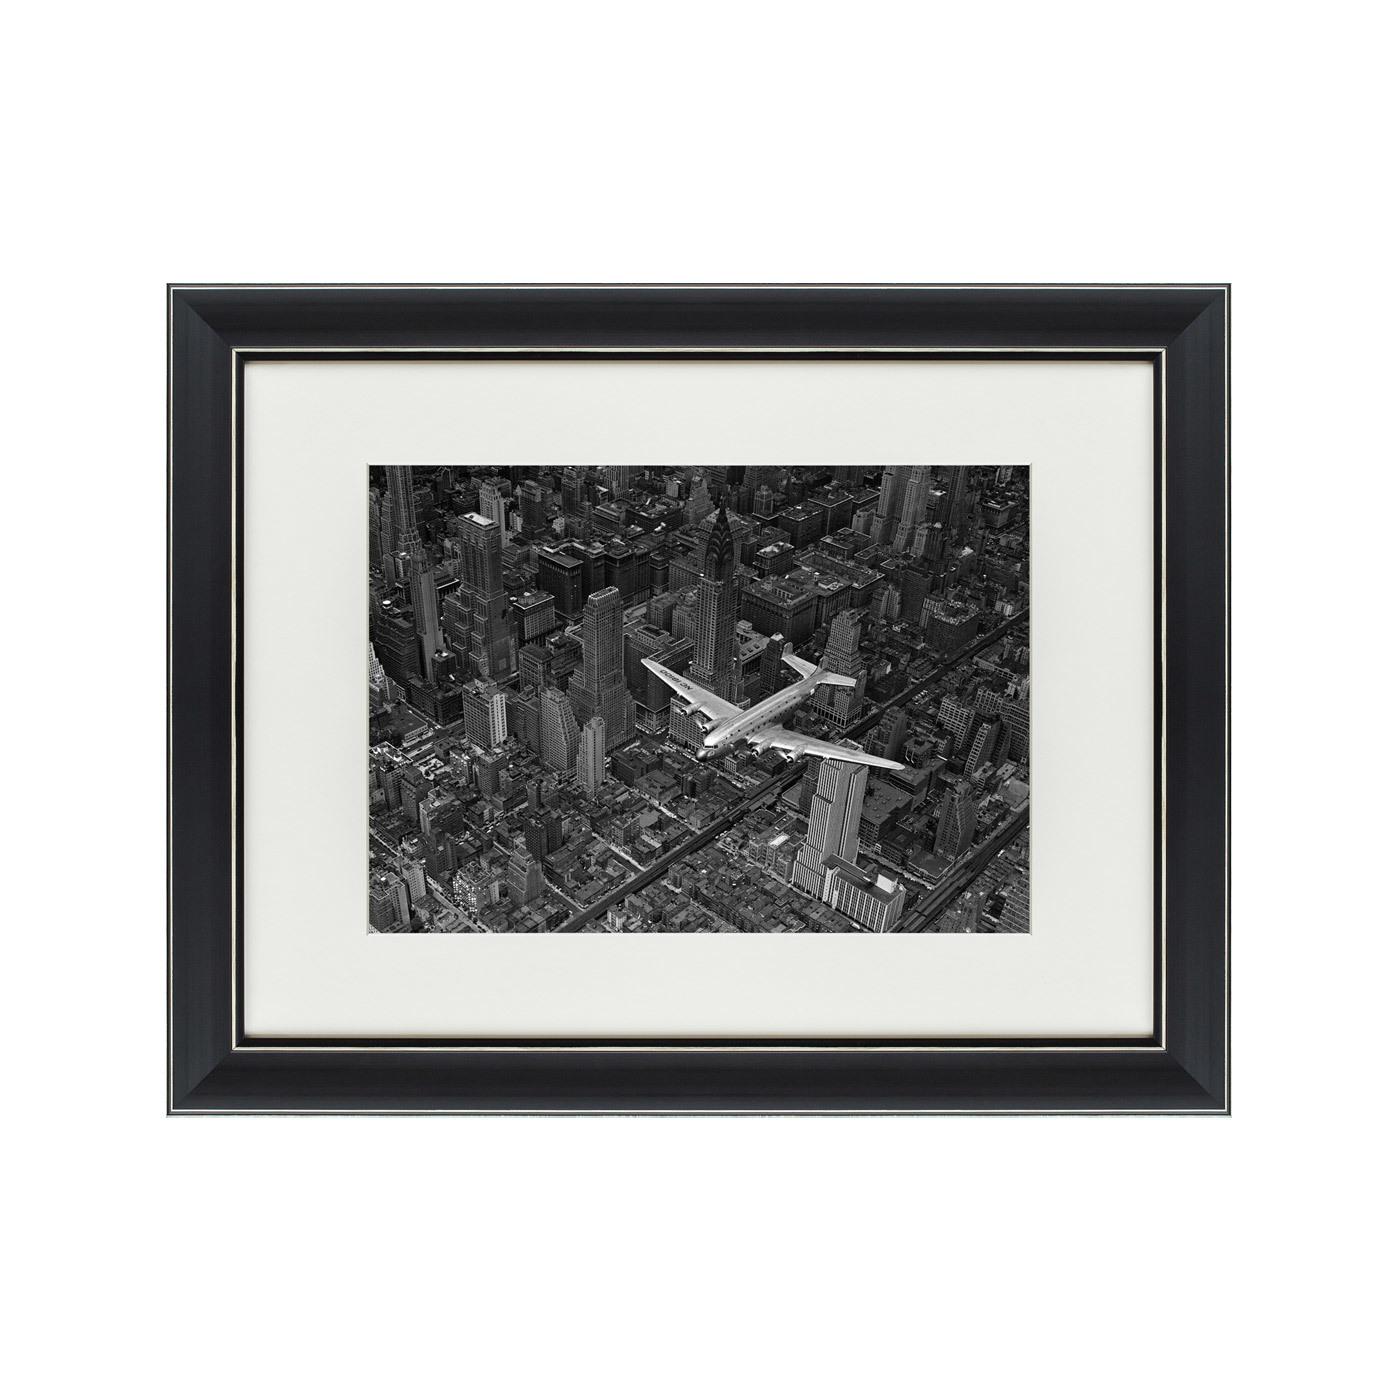 {} Картины в Квартиру Картина Пролетая Над Манхэттеном (47х60 см) картины в квартиру картина над горами 35х77 см